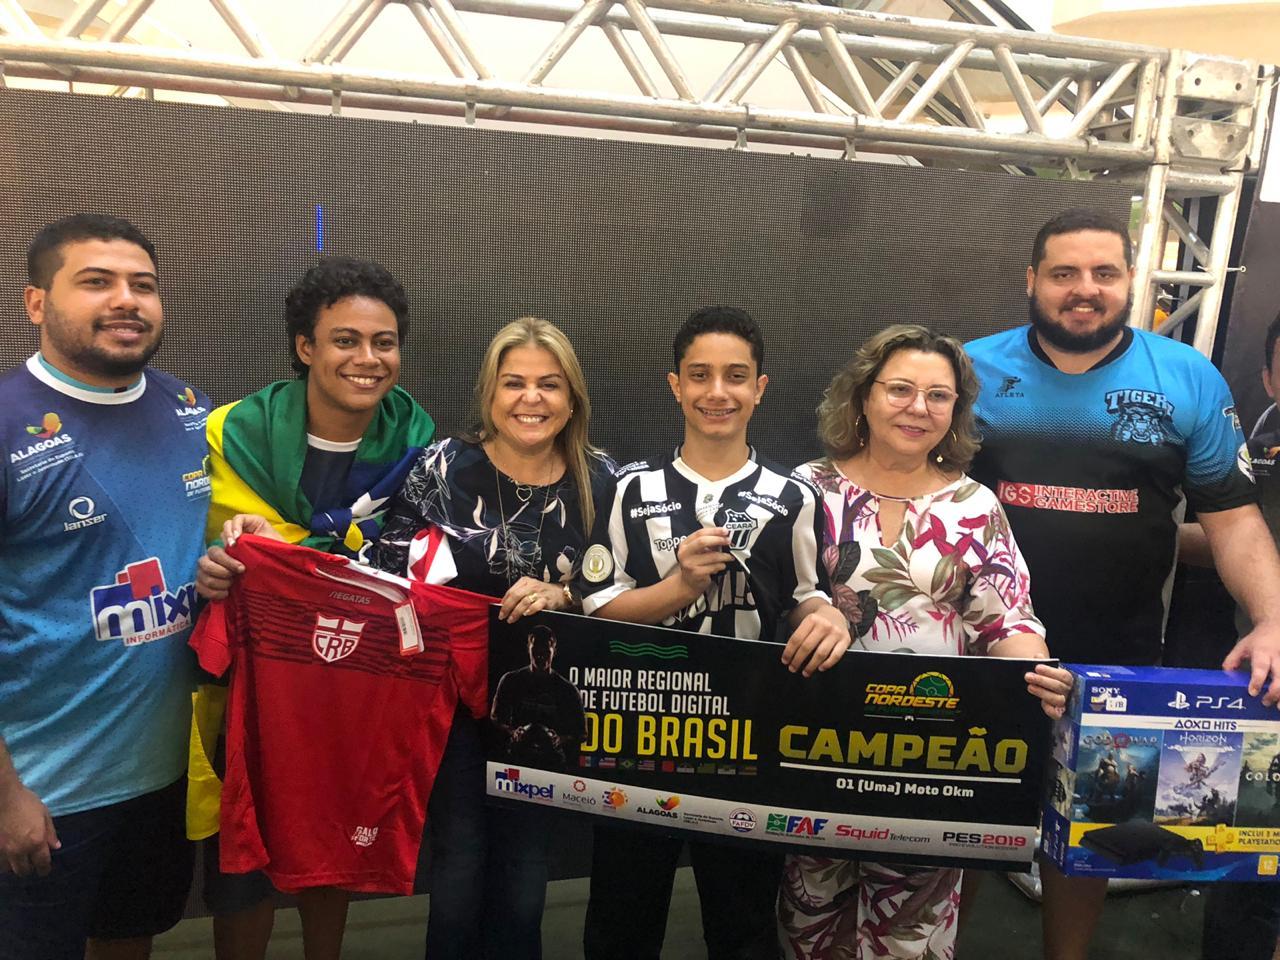 Maceió sedia pela primeira vez a Copa Nordeste de Futebol Digital